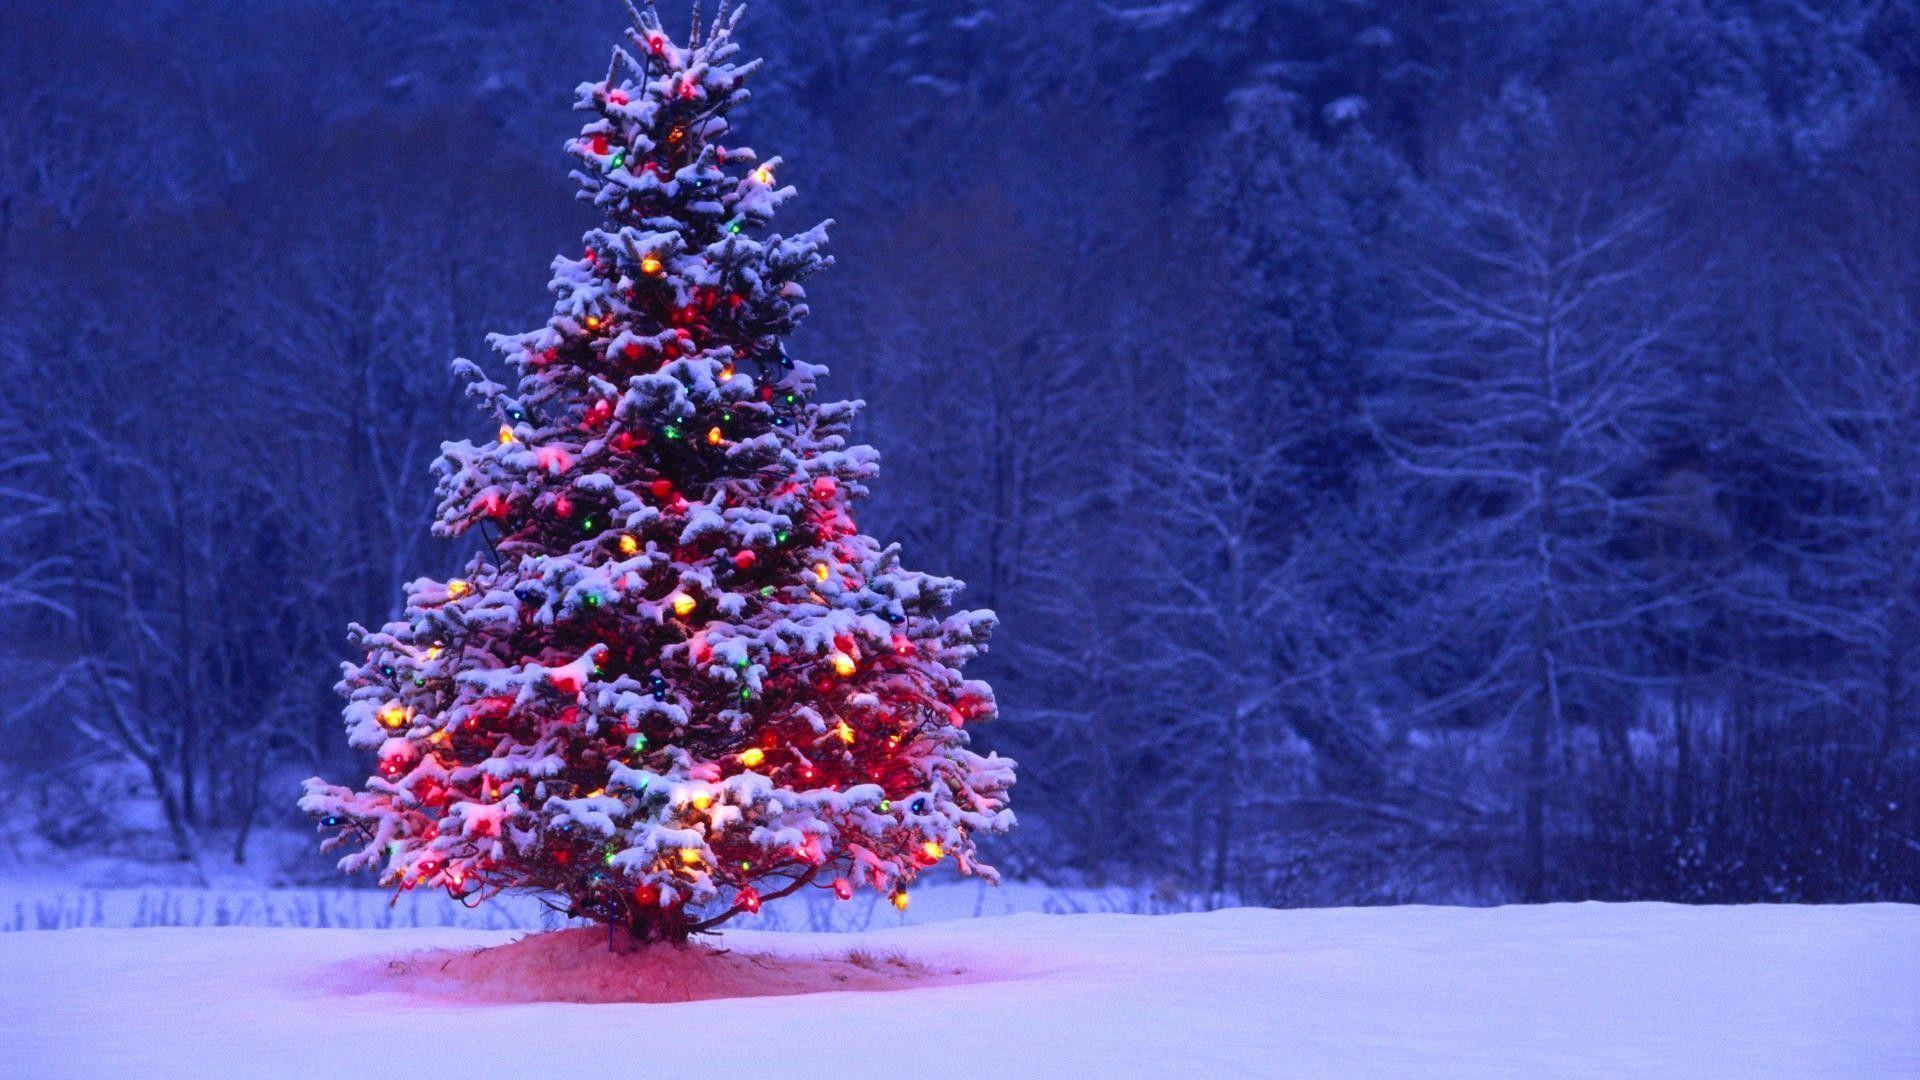 Fortnite Christmas Tree Background.Christmas Tree Wallpaper Backgrounds Wallpaper Cave